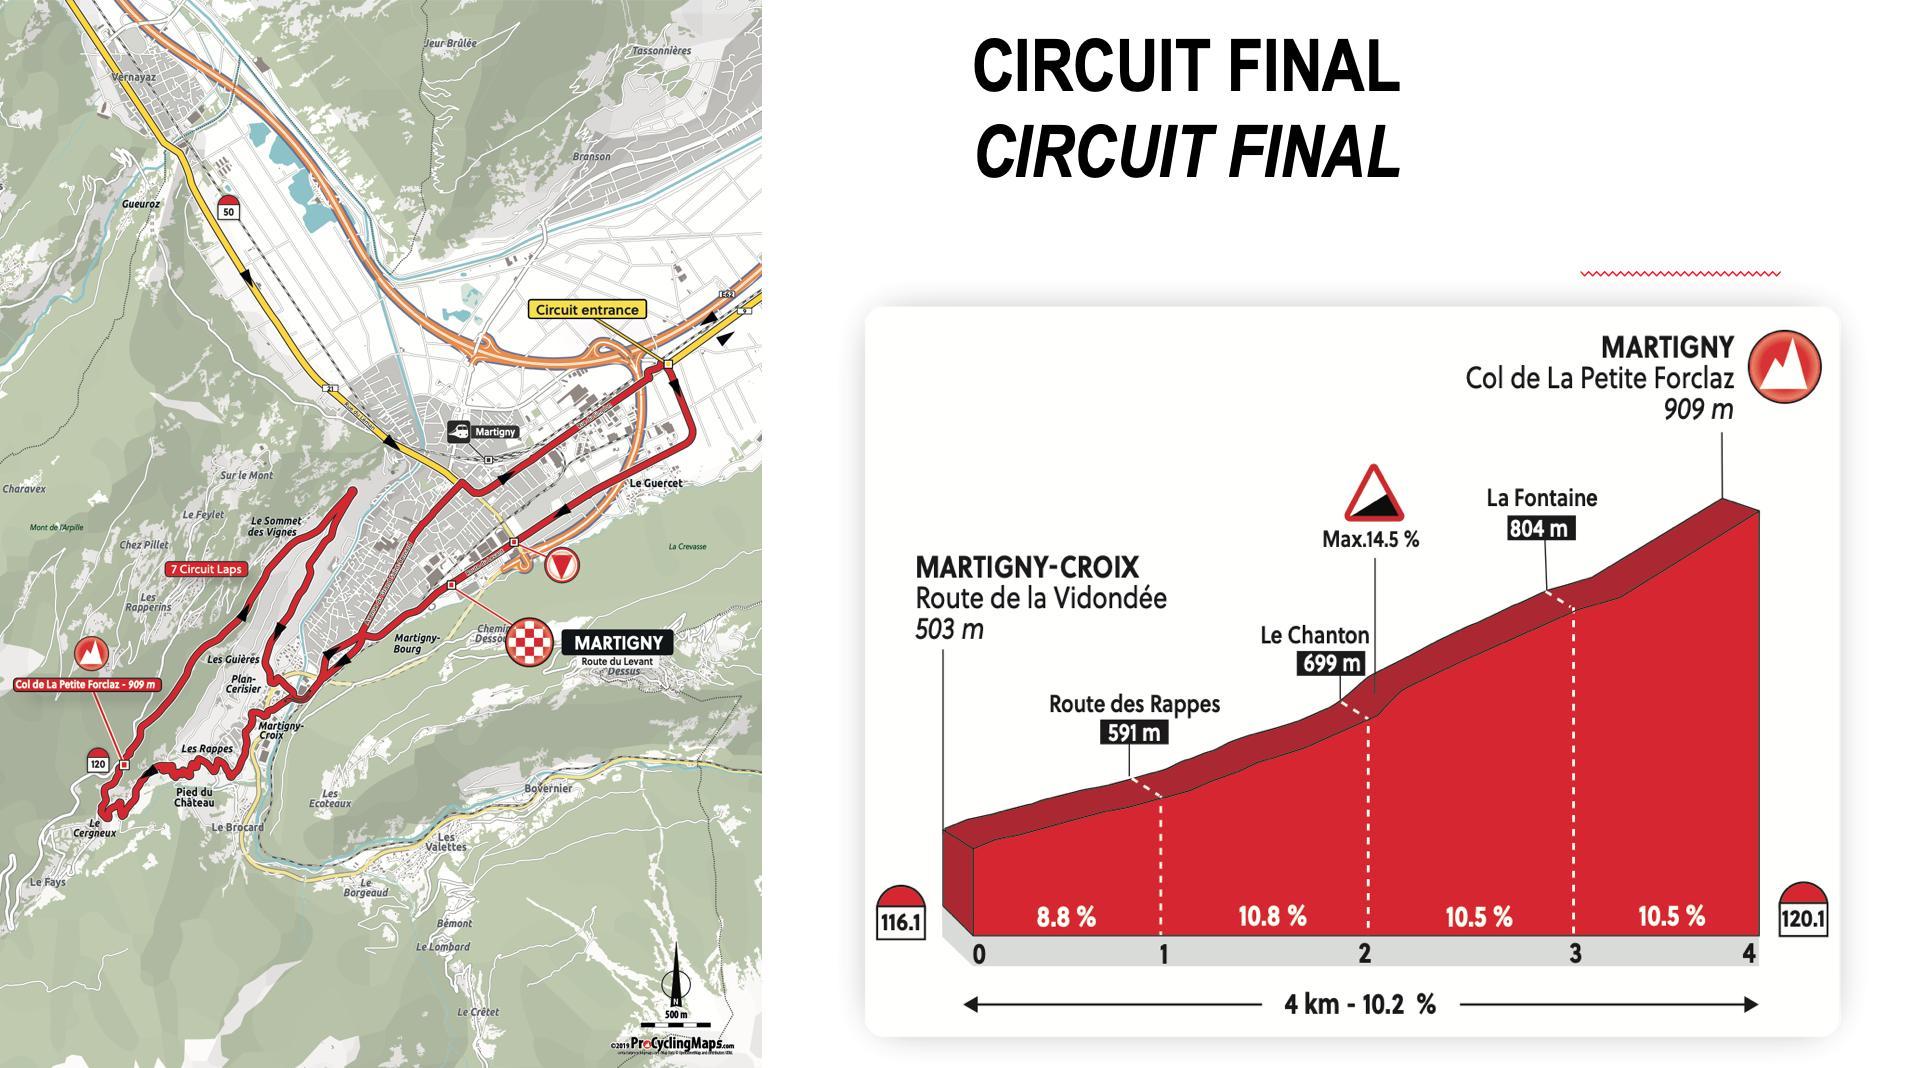 Parcours des courses - Page 11 EFVYK7NW4AIJSph?format=jpg&name=large